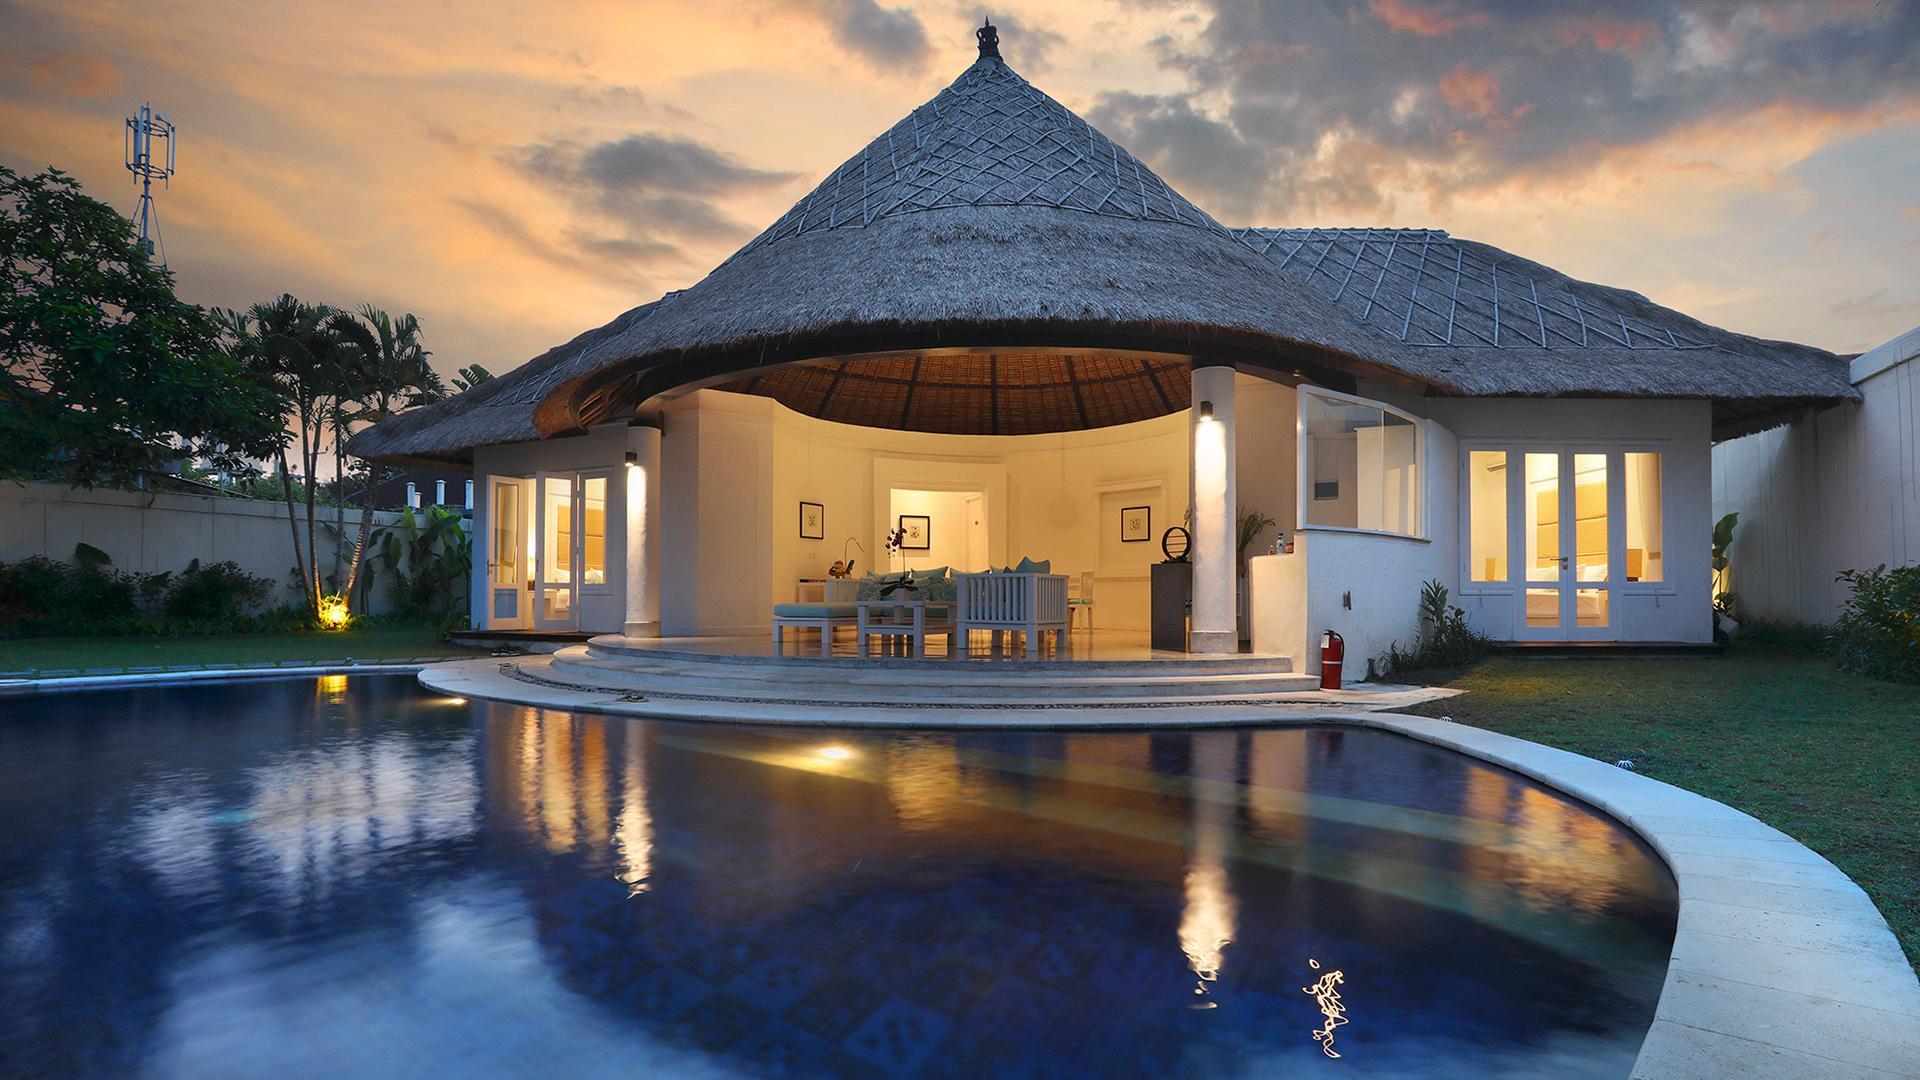 Two Bedroom Pool Villa image 1 at Alam Boutique Resort 2019 by Kabupaten Badung, Bali, Indonesia